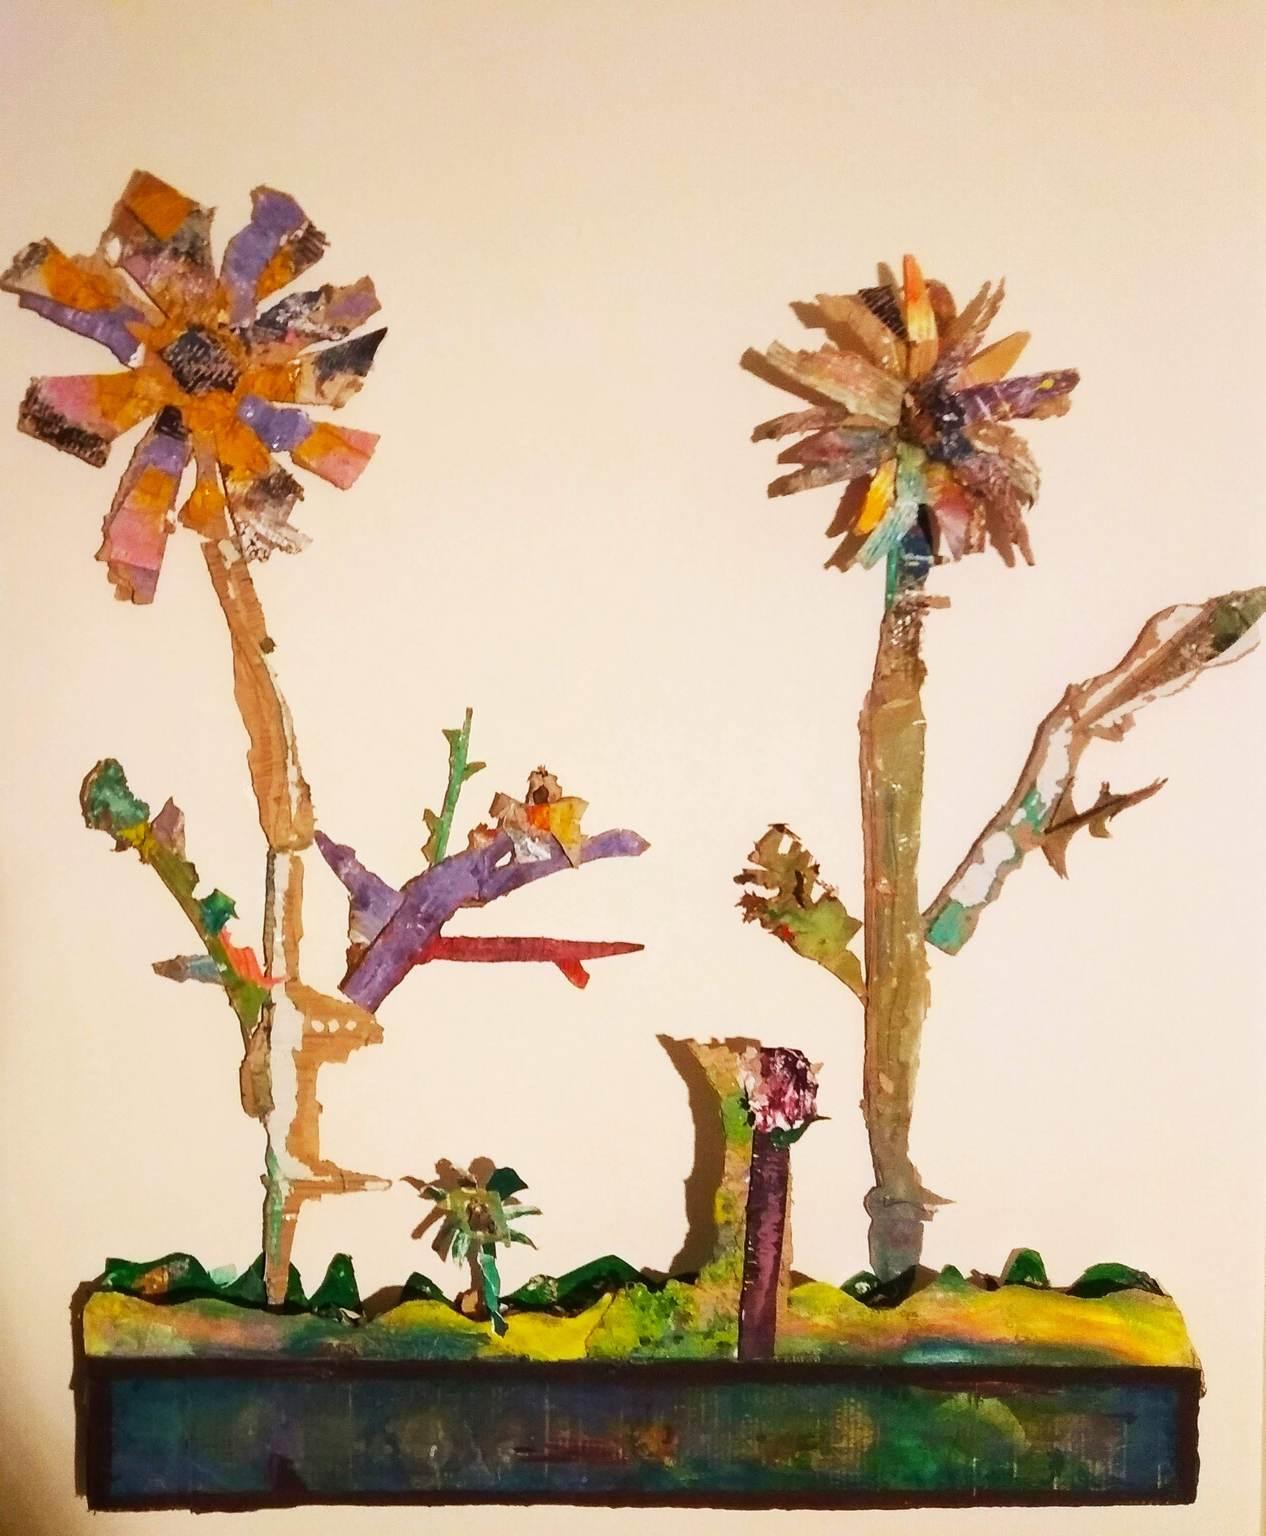 Flowers - Mixed technic - 100x160cm